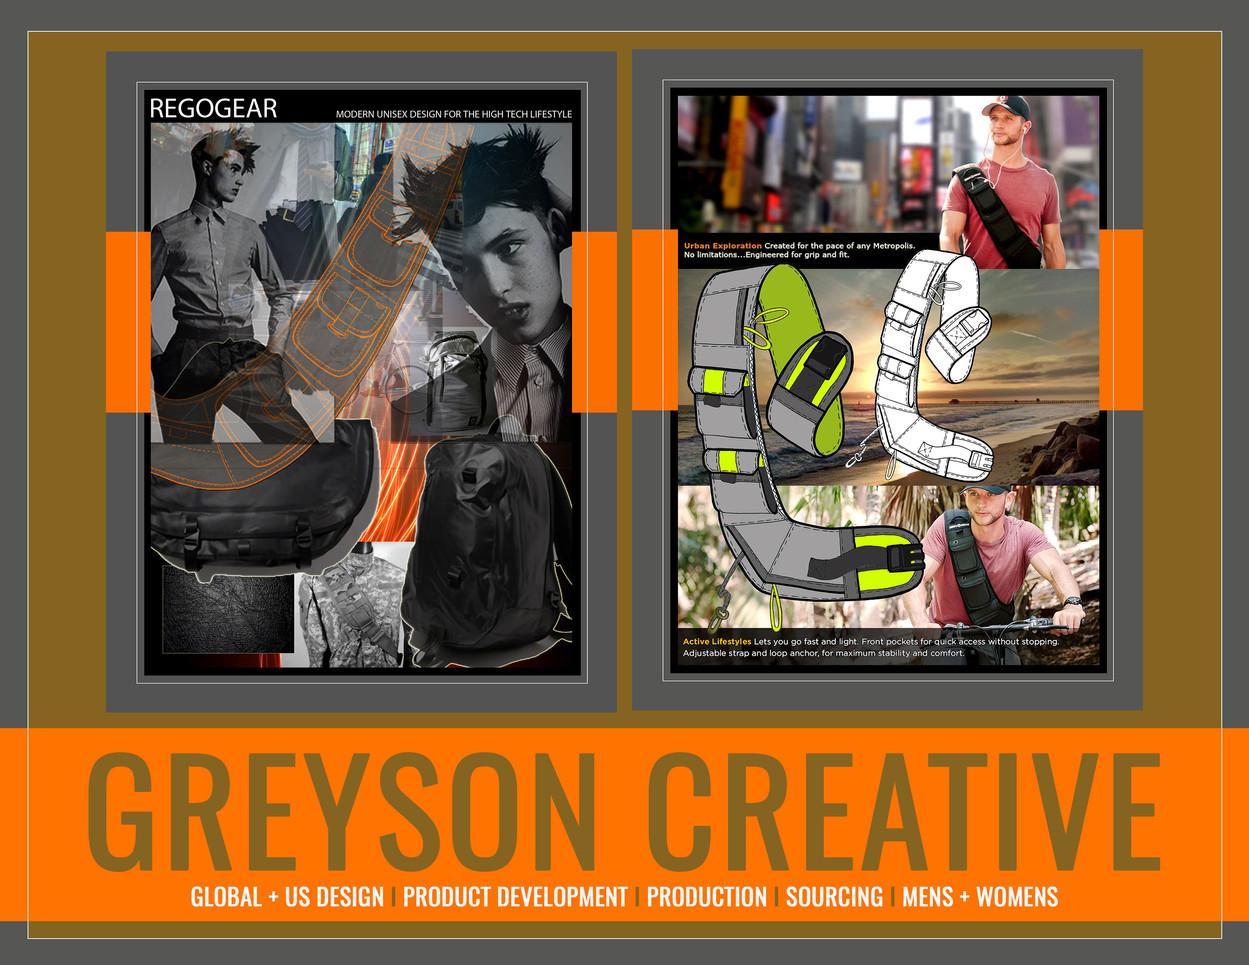 RegoGear: Greyson Creative by Lukas Greyson